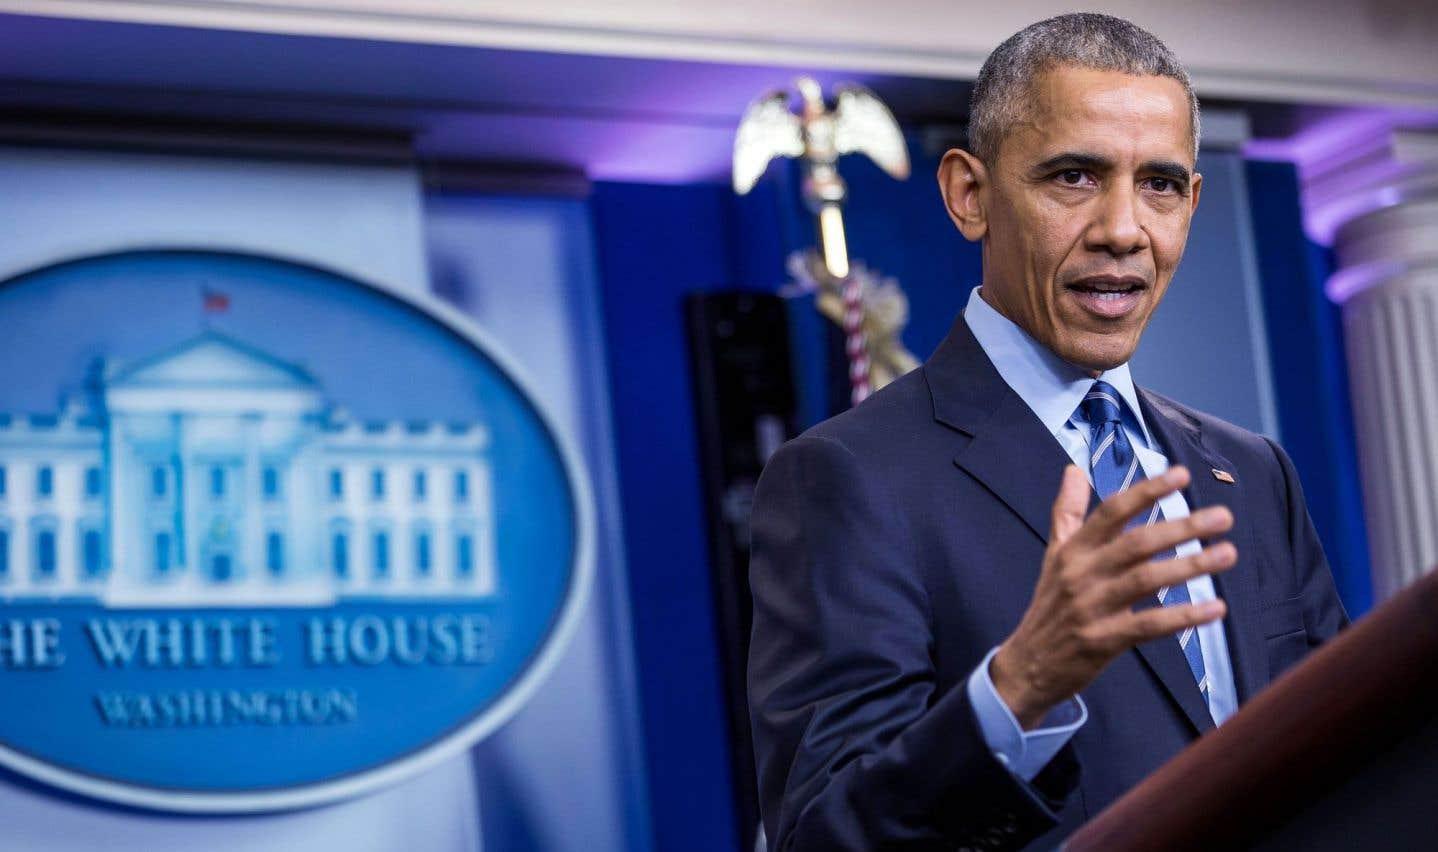 Piratage informatique: le ton monte entre Obama et Poutine